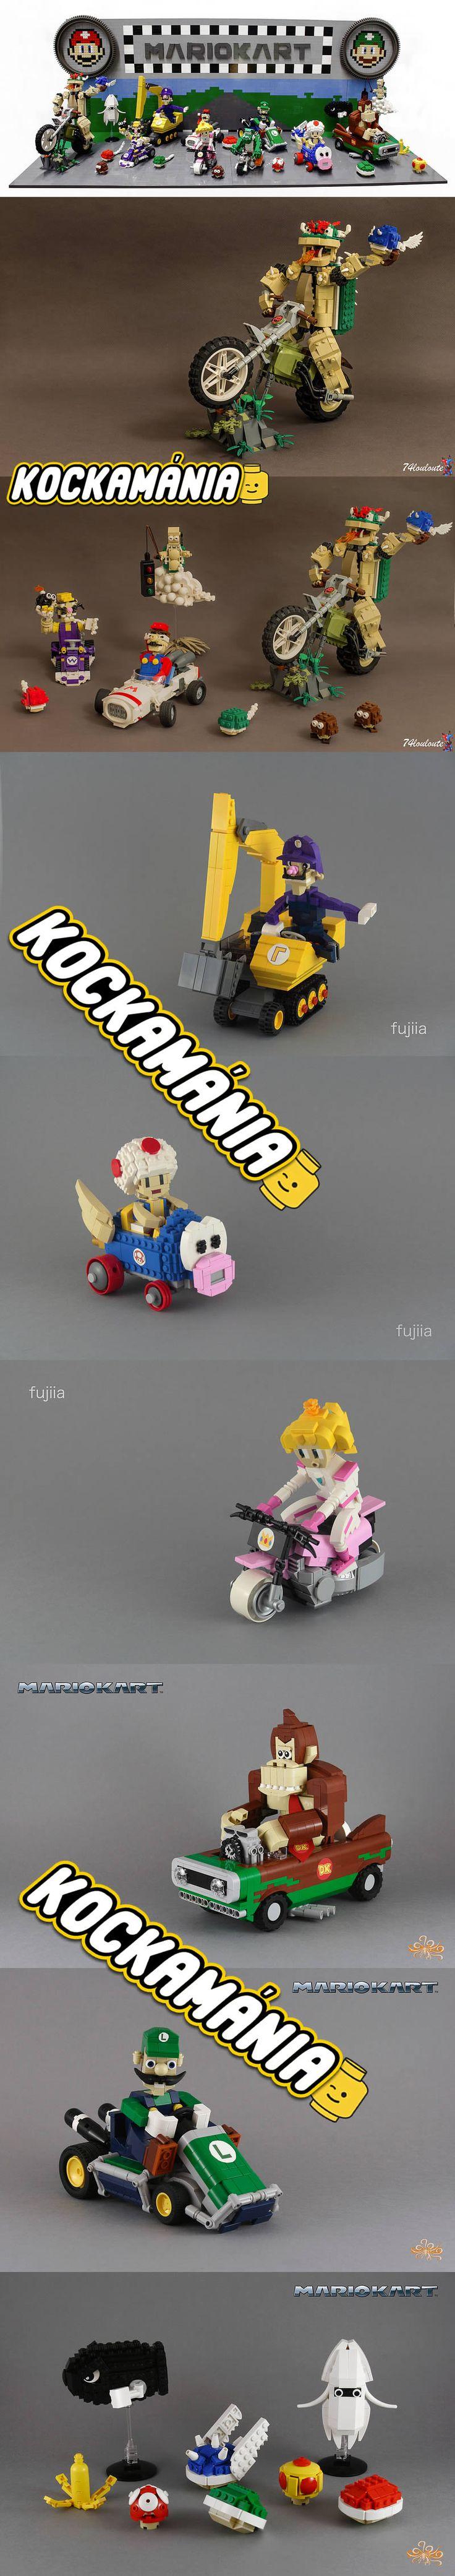 Mario Kart #LEGO #Mario #games #game #Luigi #DonkeyKong #Yoshi #arcade #Nintendo #gokart